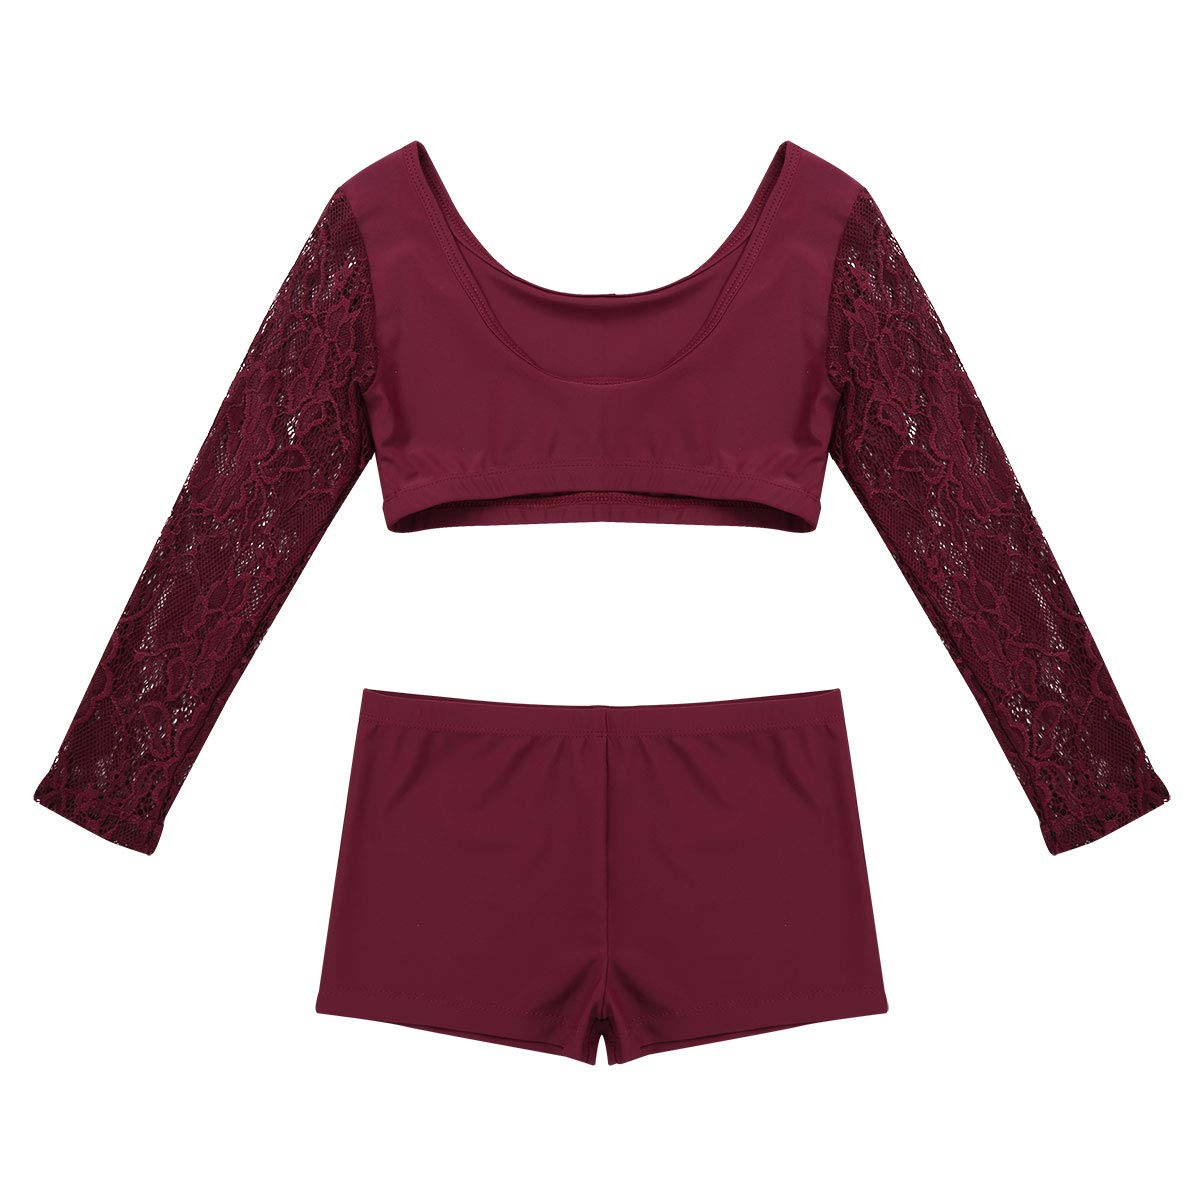 inlzdz Kids Girls 2PCS Tankini Sleeveless Racer Back Top with Booty Shorts Gymnastics Leotard Dancewear Sports Outfit